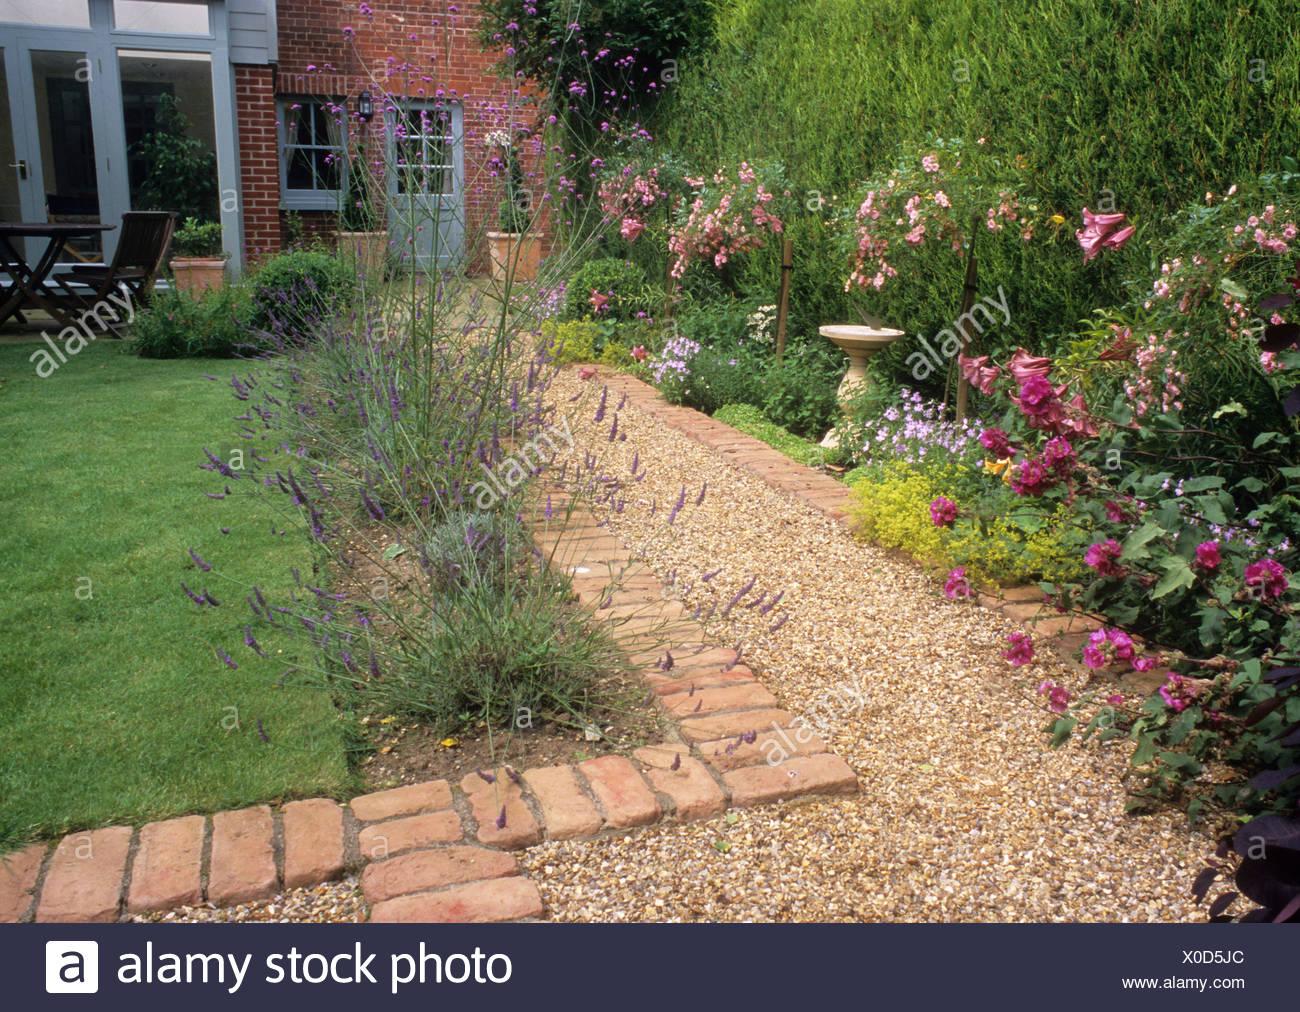 Path Gravel Brick Small Back Garden Design Lawn House Border